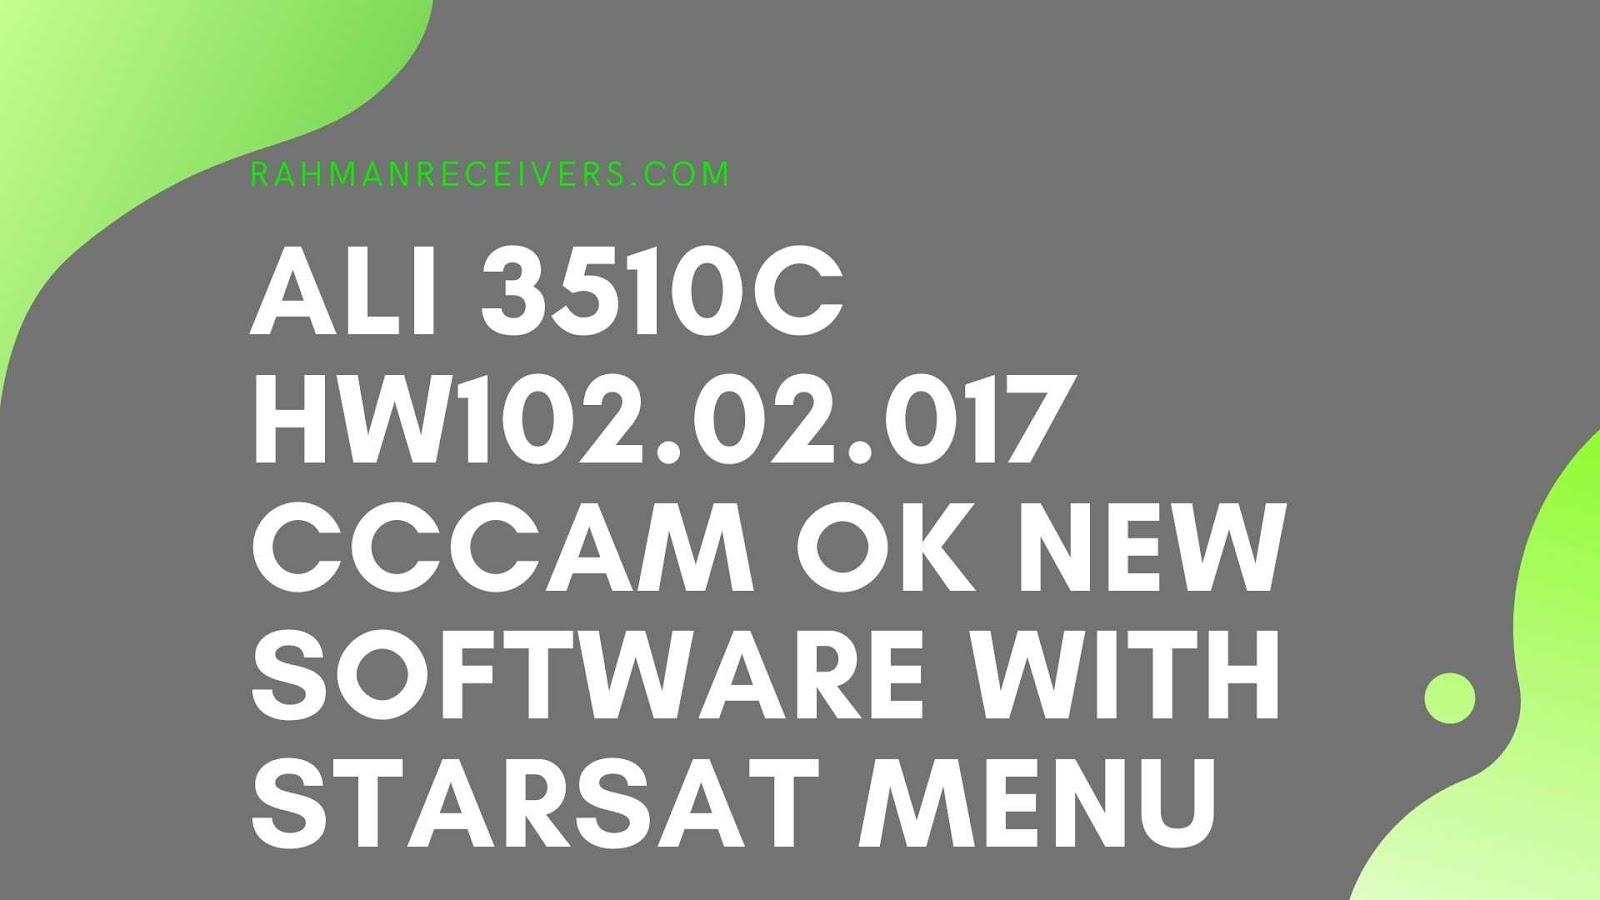 ALI 3510C HW102.02.017 CCCAM OK NEW SOFTWARE WITH STARSAT MENU 29 MARCH 2020